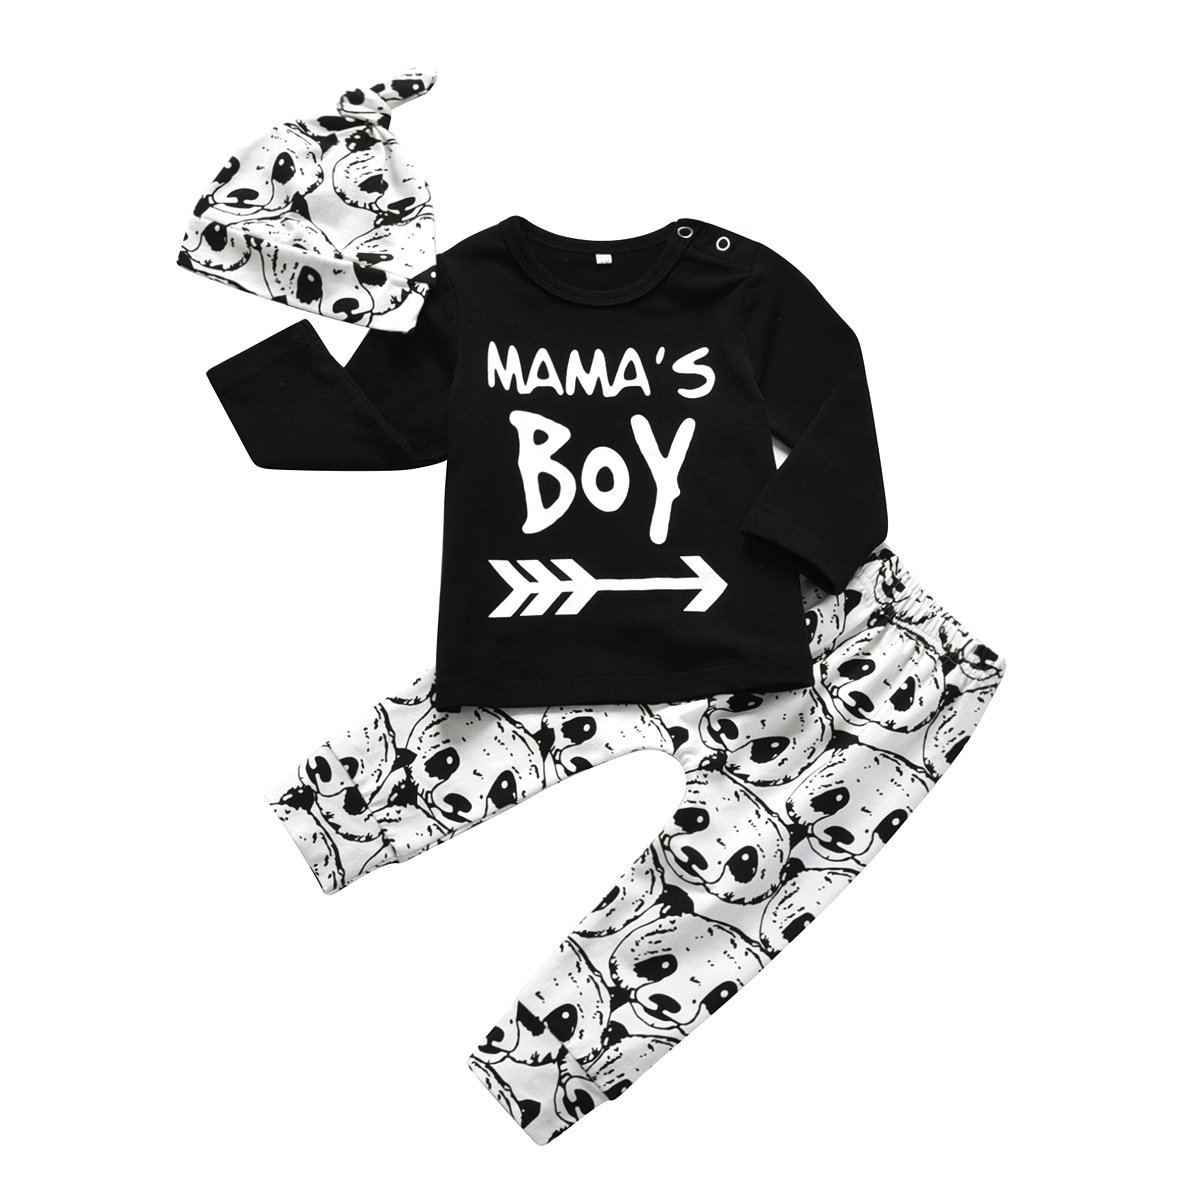 Amazon.com: Baby Boy - Juego de ropa de manga larga para ...